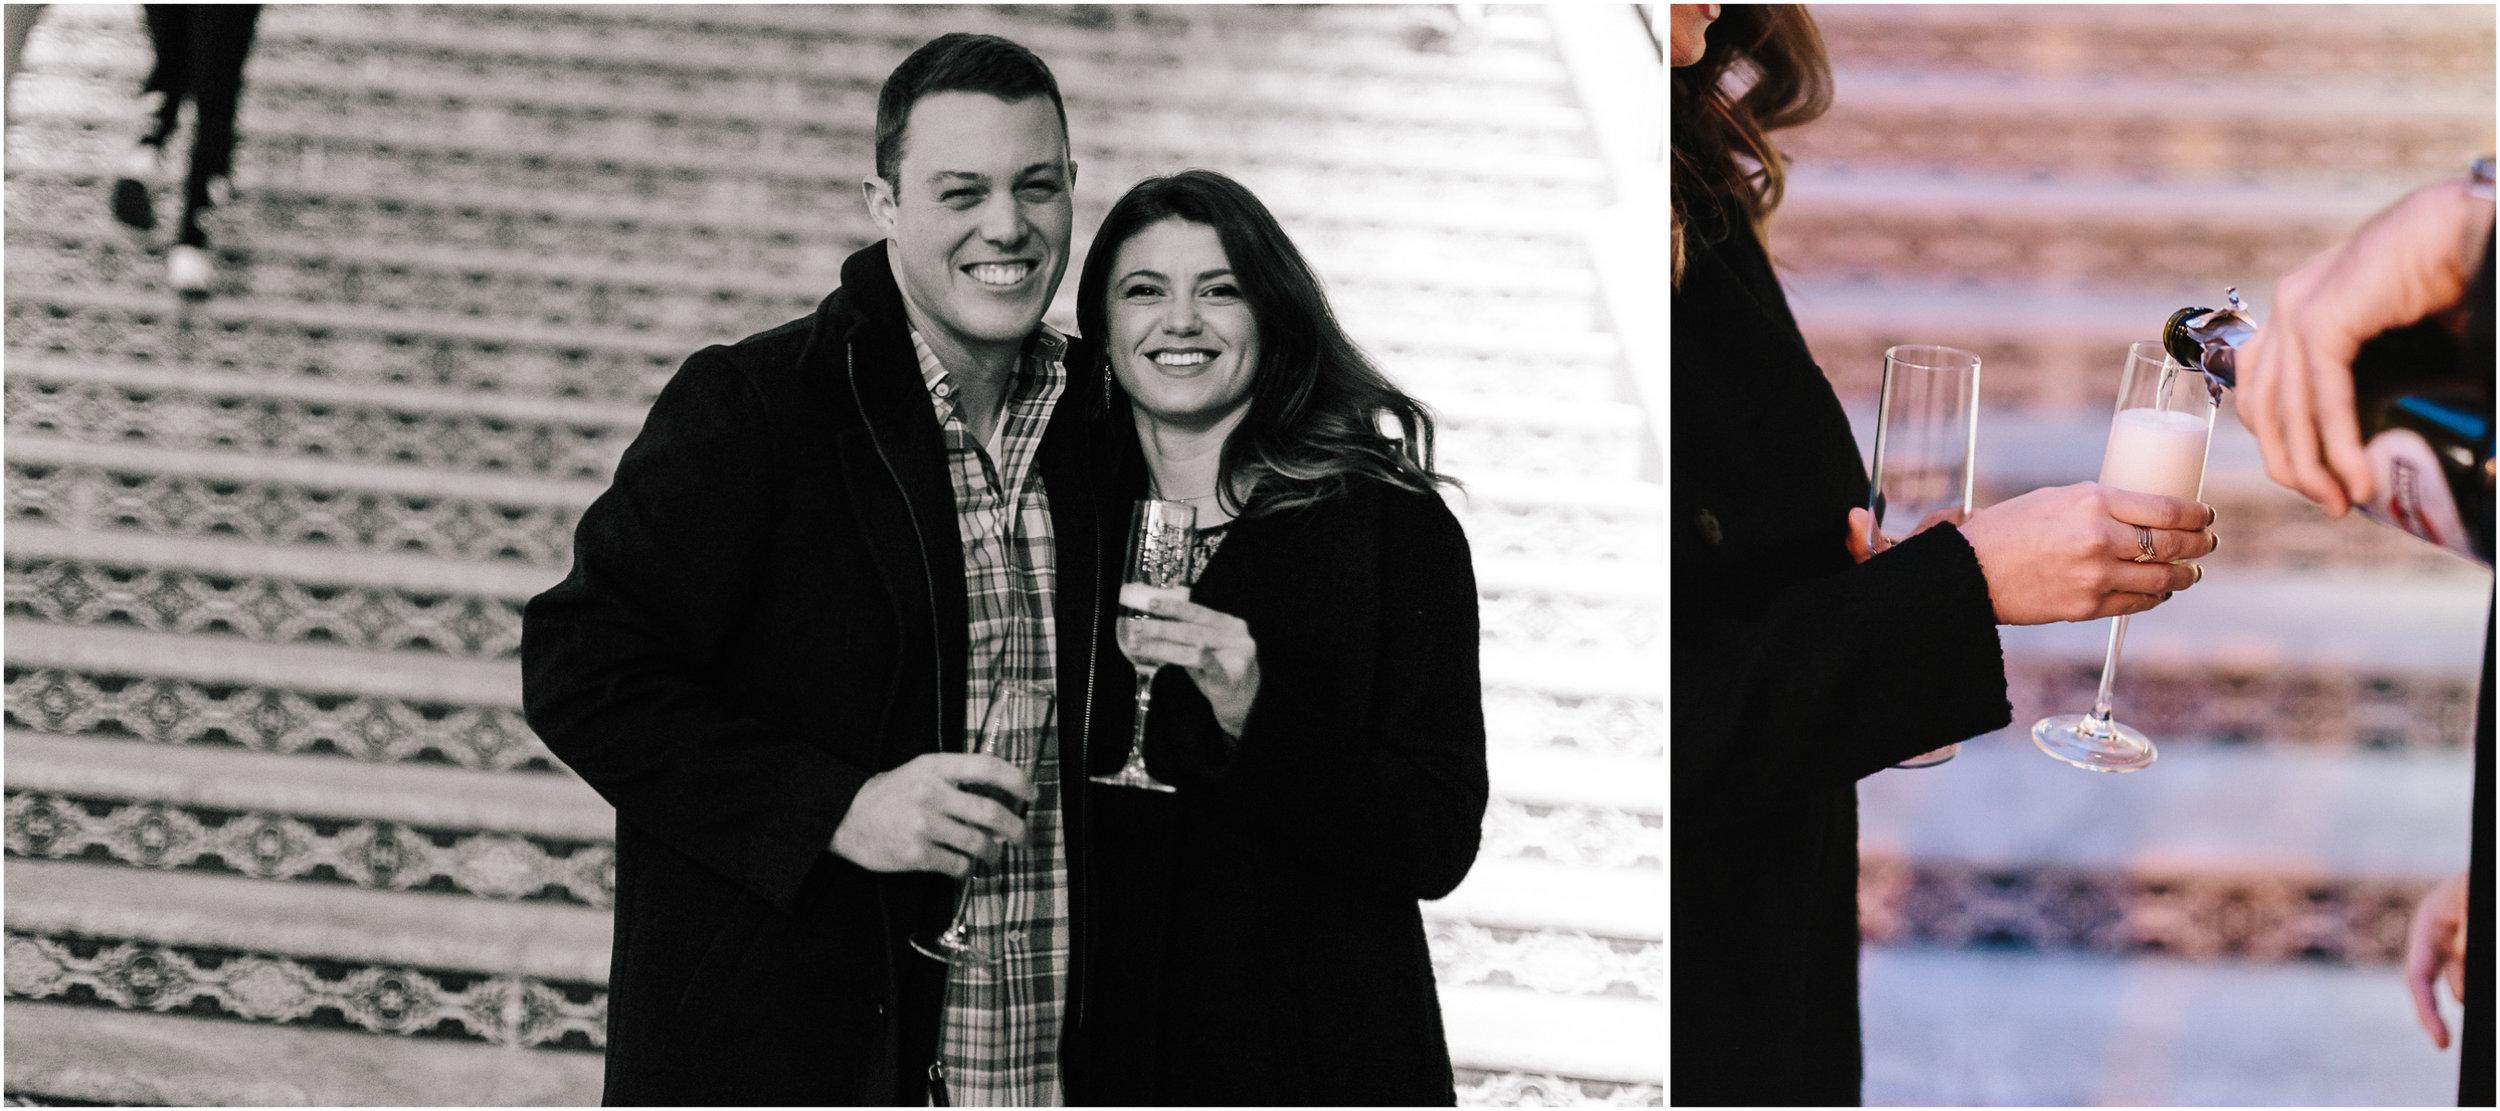 alyssa barletter photography christmas winter wedding proposal plaza lights plaza stairs she said yes-6.jpg